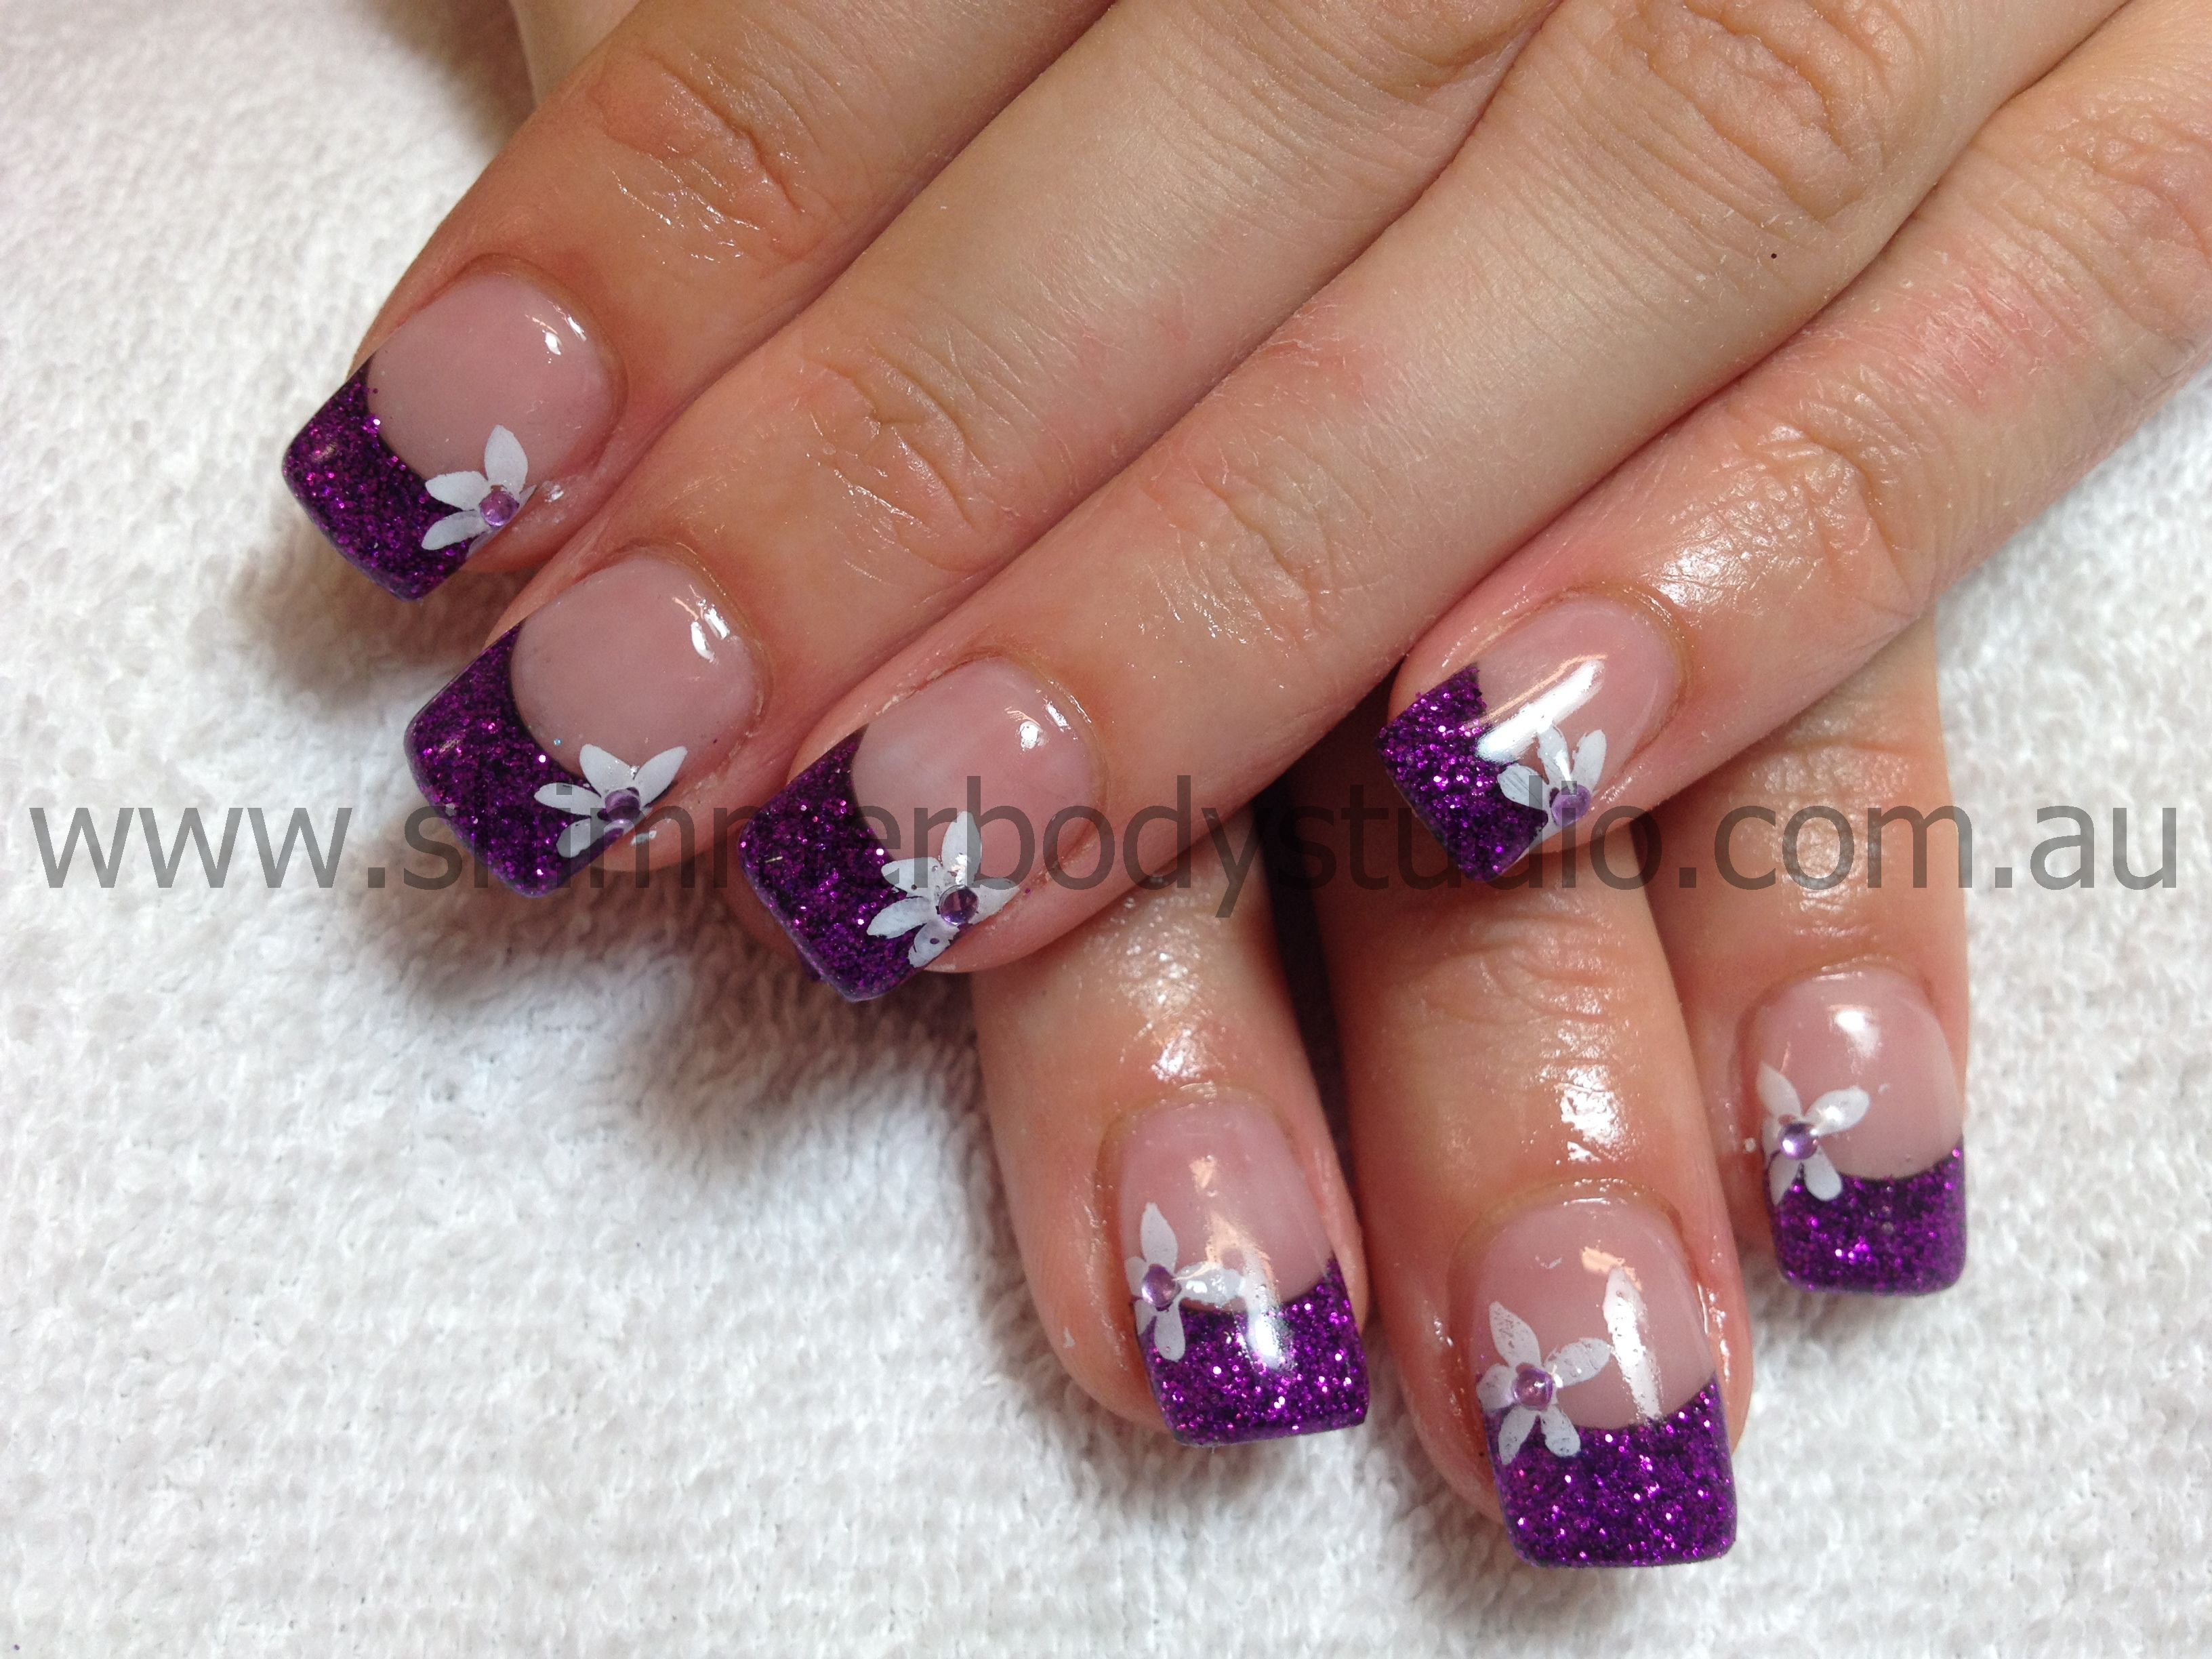 Gel nails, Glitter nails, Purple Nails, Flower Nail Art ...